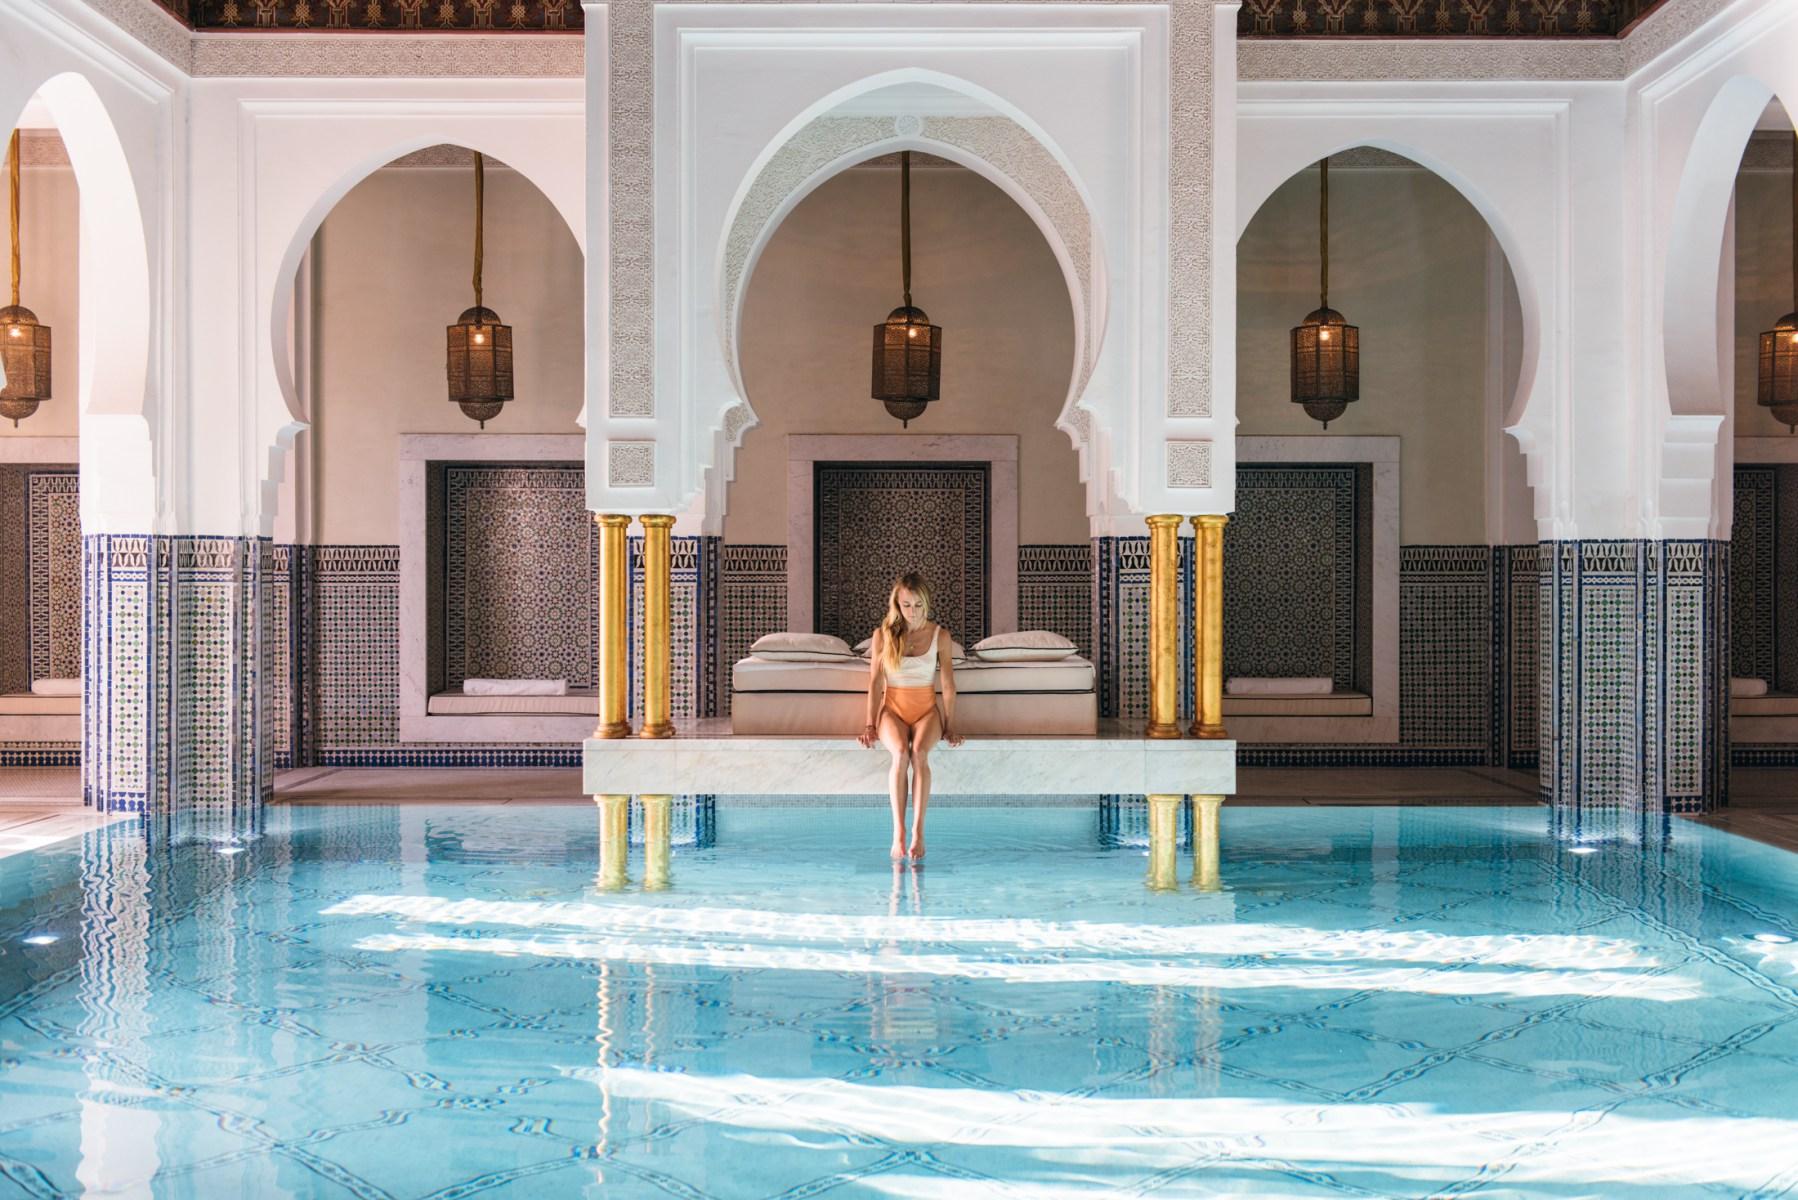 Morocco To Put Luxury Jewel La Mamounia On Sale In 2019